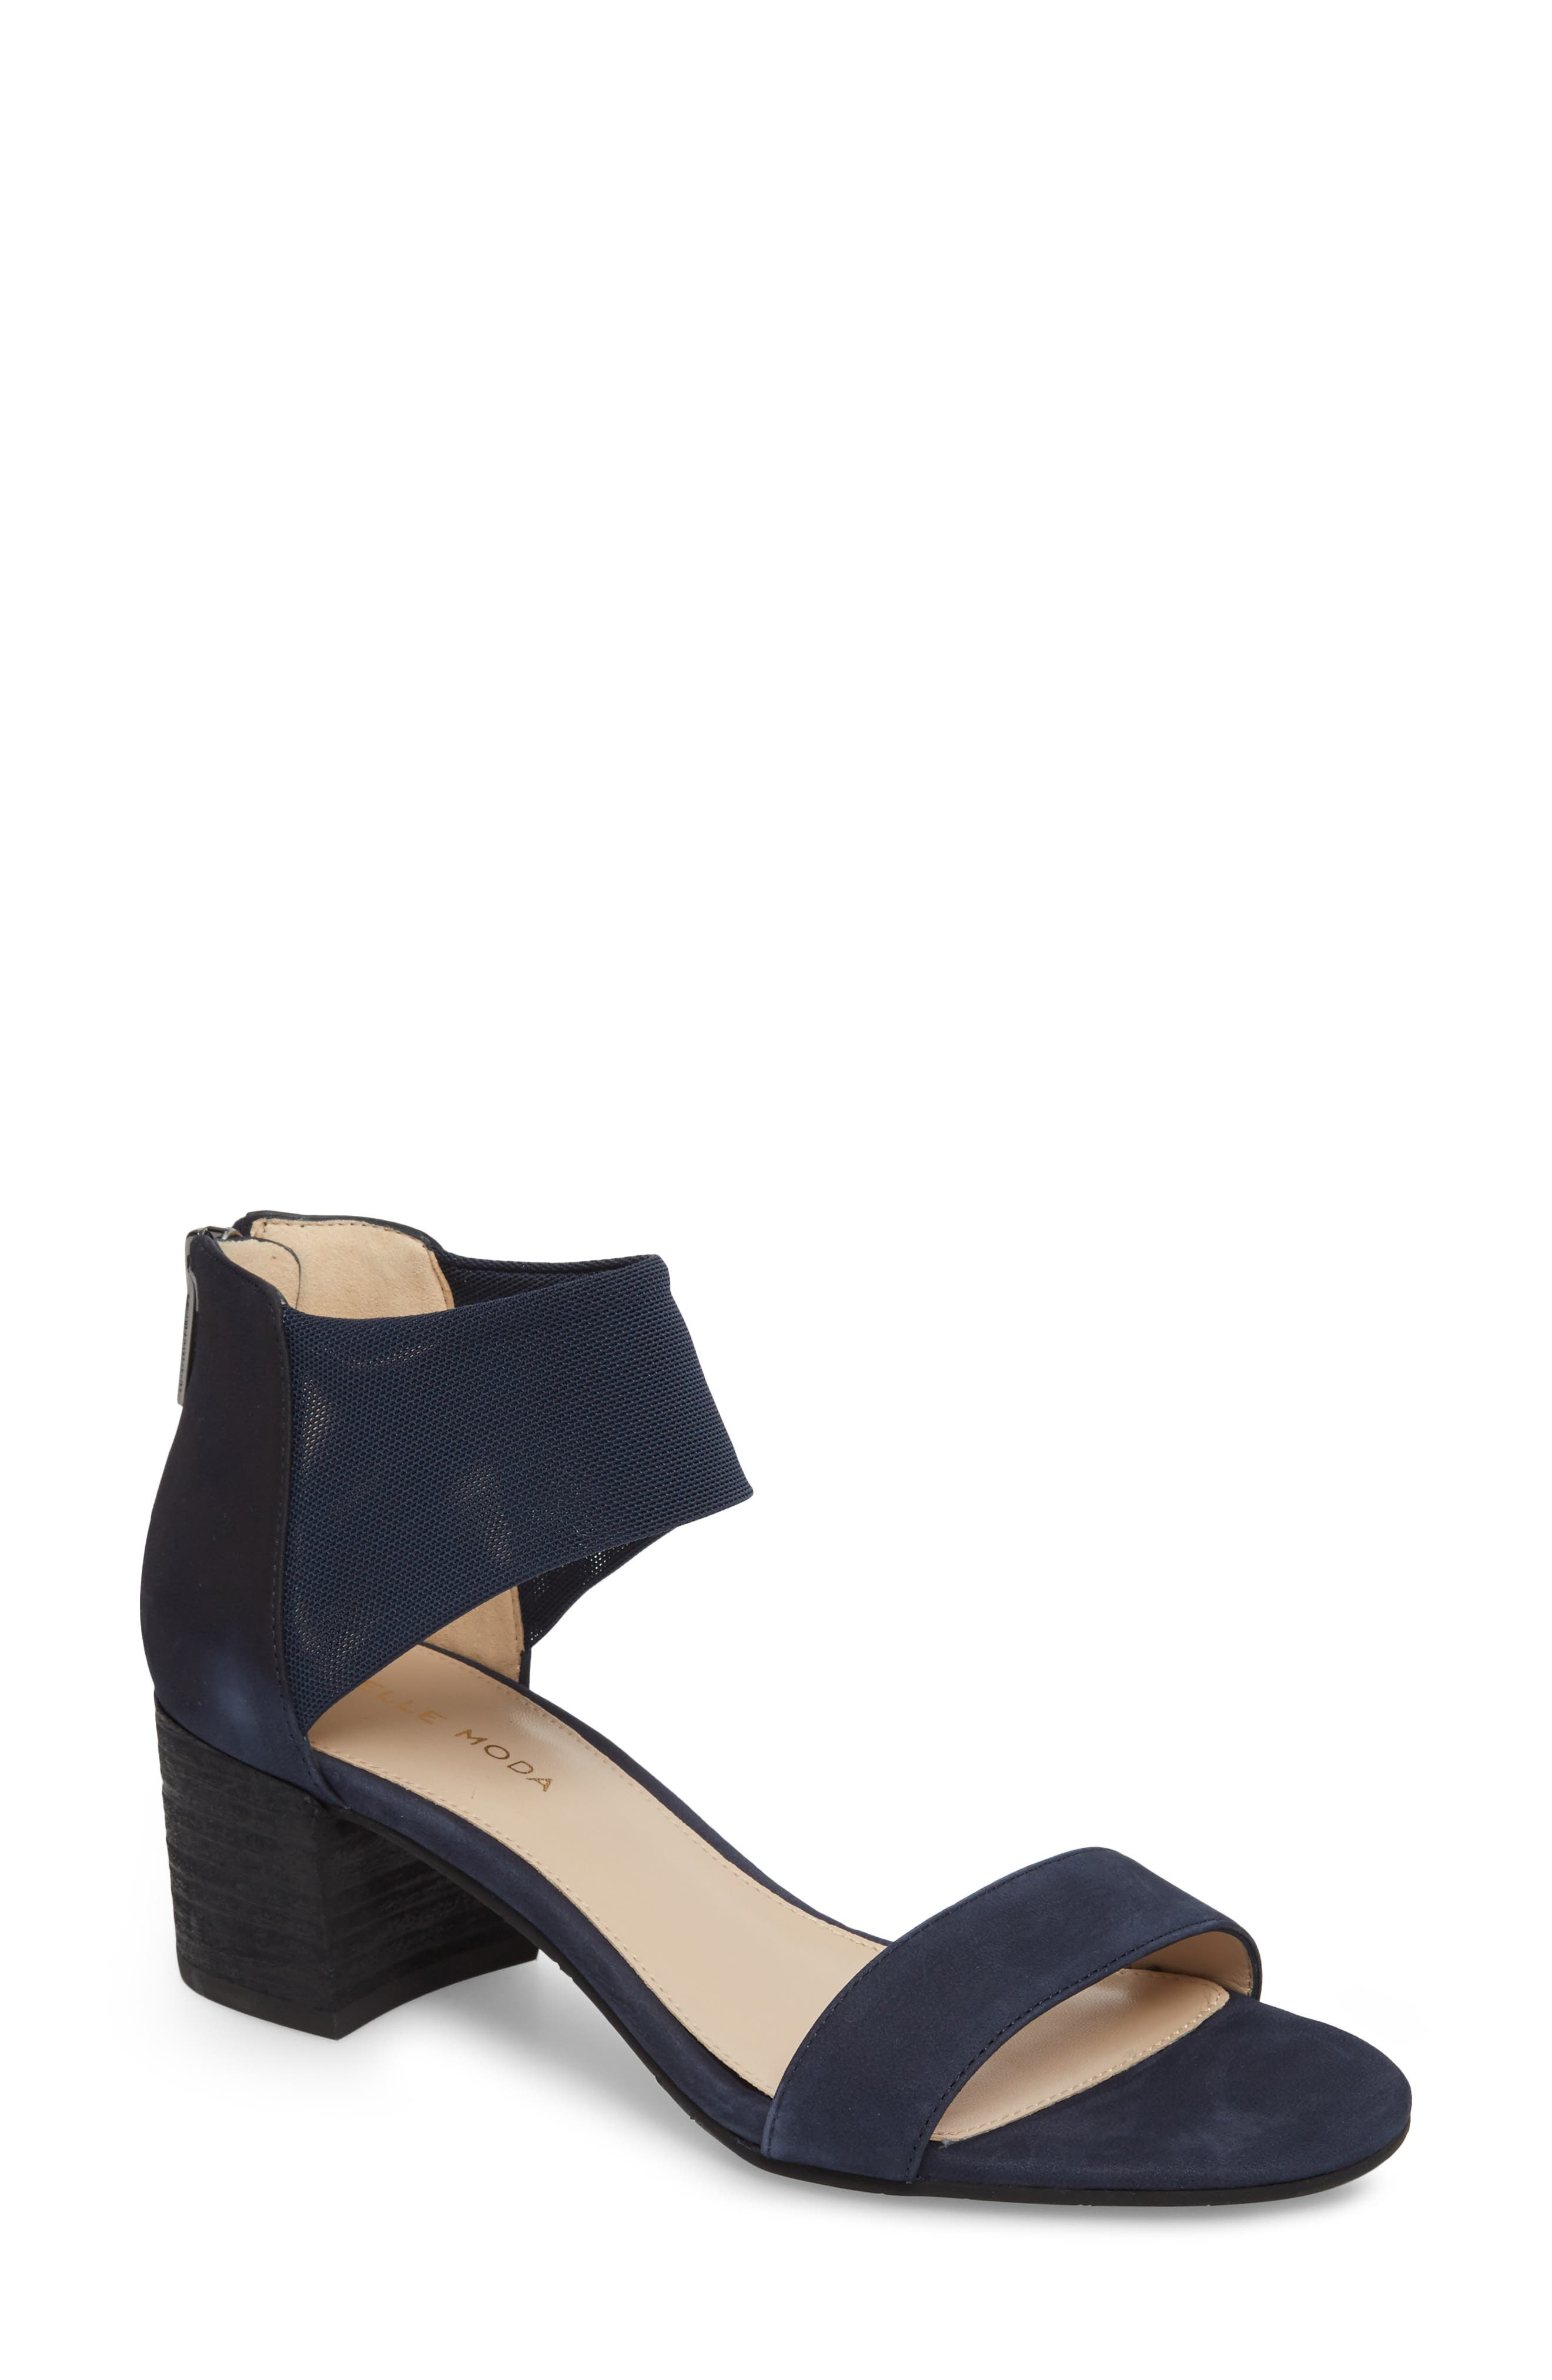 Alden Mesh Strap Sandal,                         Main,                         color, Midnight Nubuck Leather